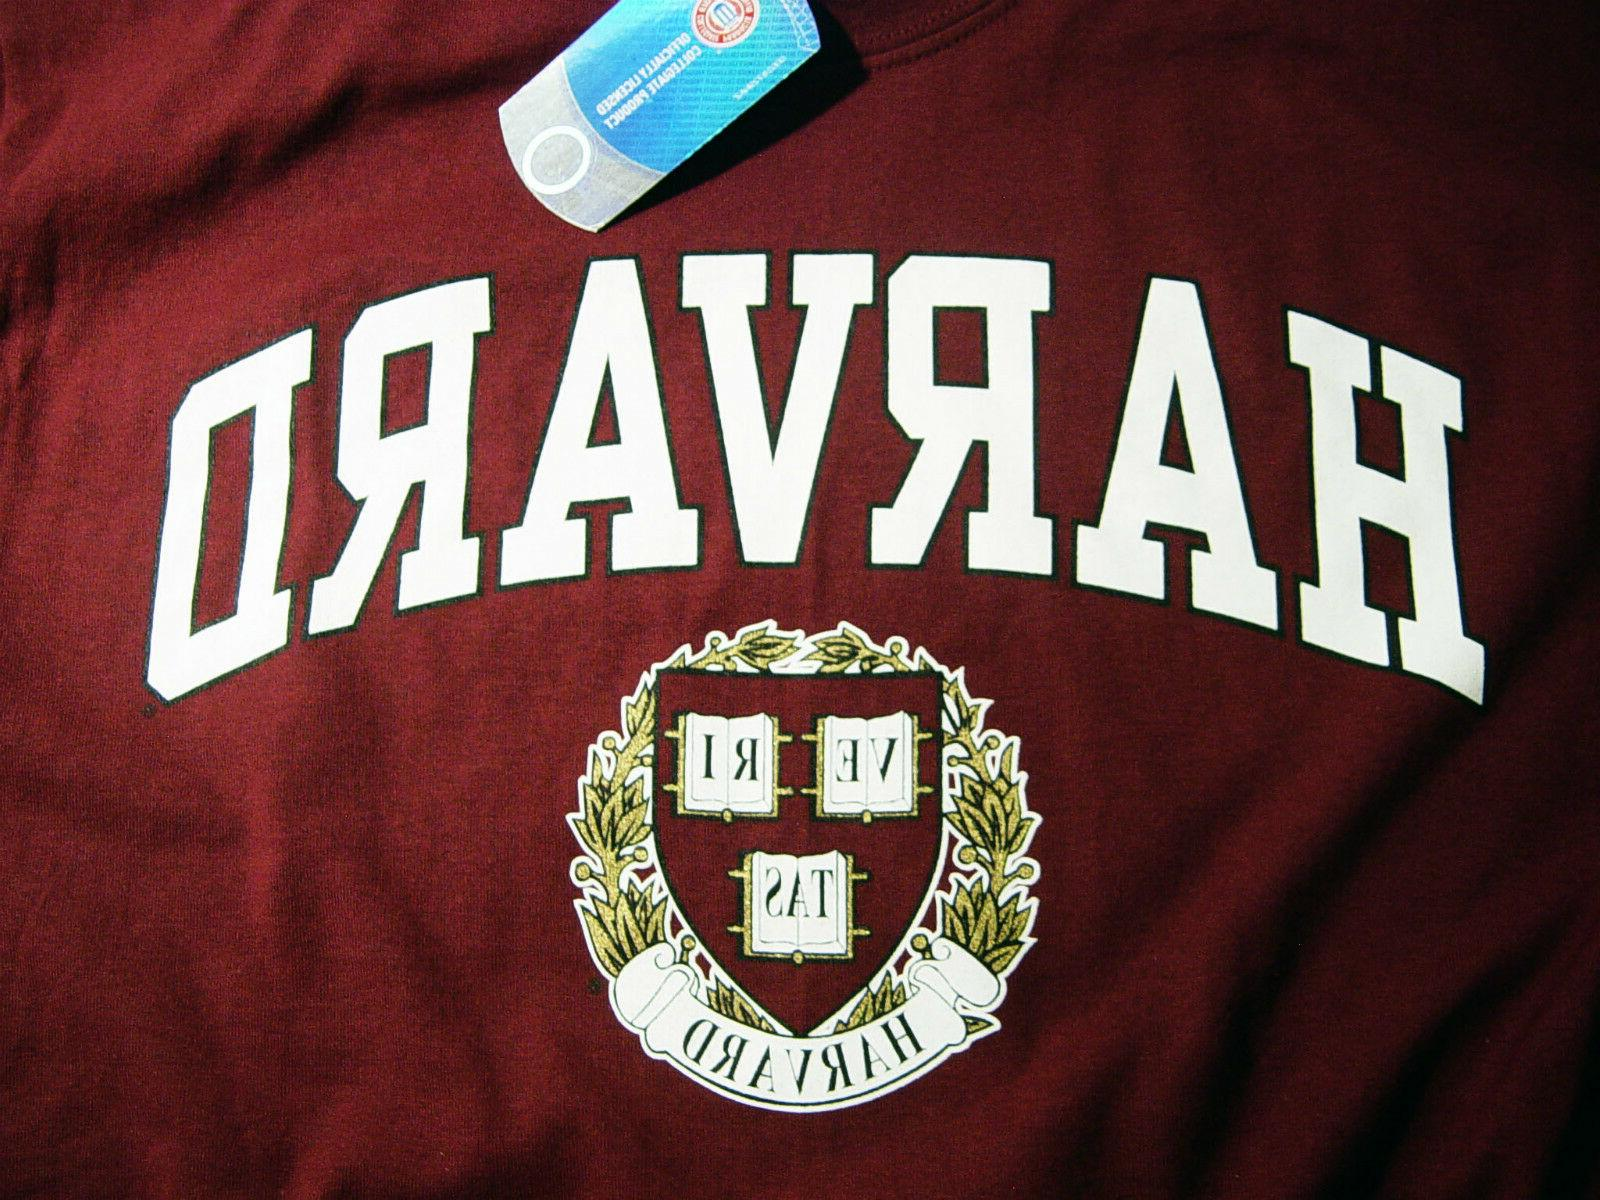 Harvard Shirt T-Shirt University Gifts Womens Mens Apparel